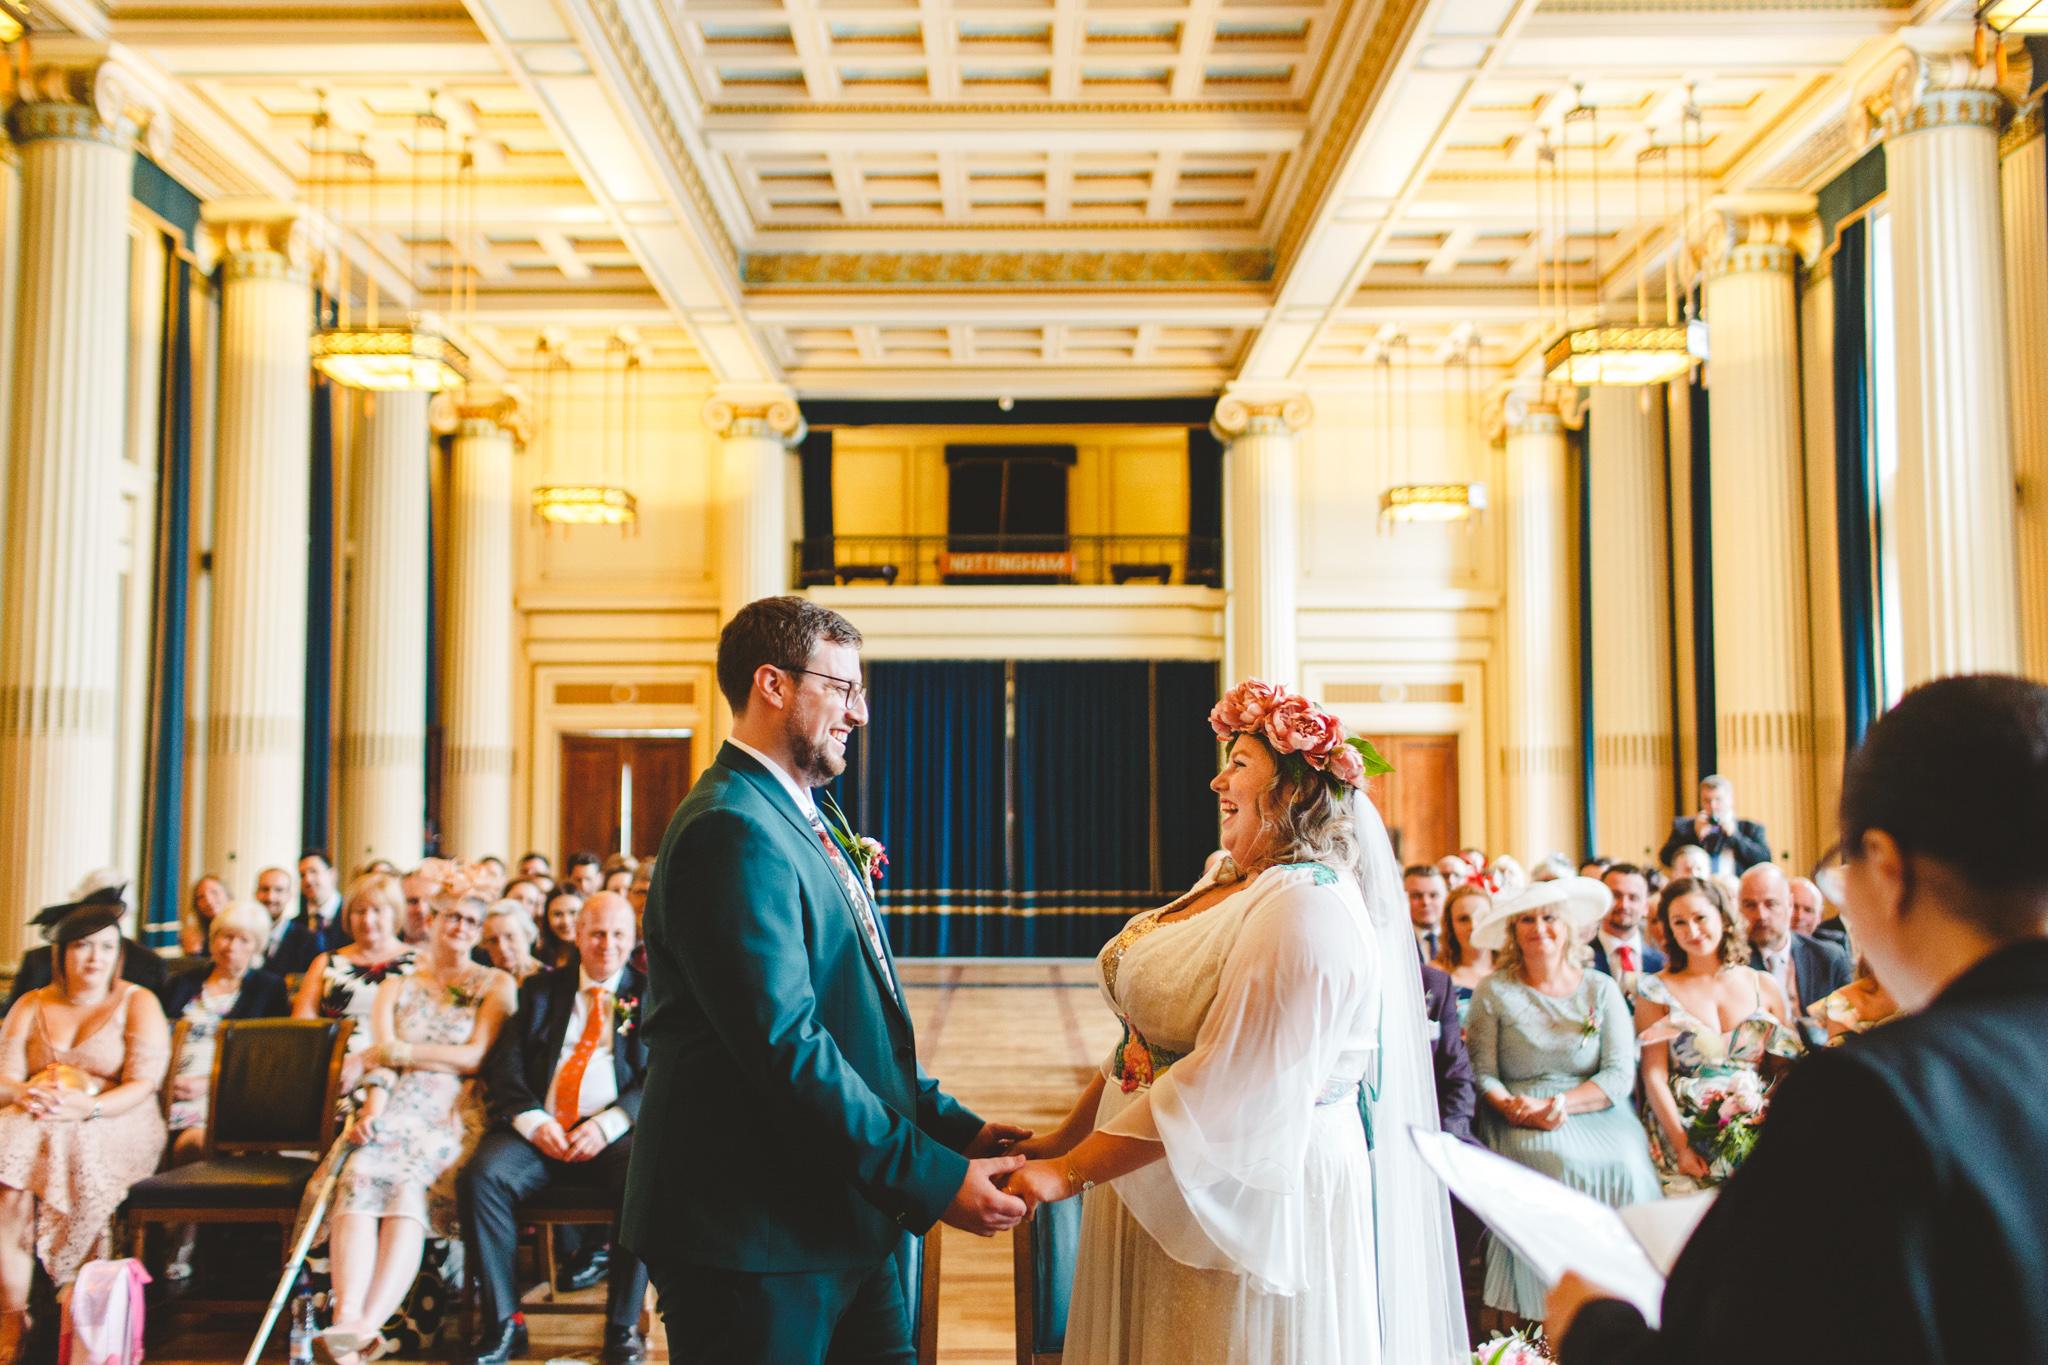 derbyshire-wedding-photographer-videographer-camera-hannah-36.jpg